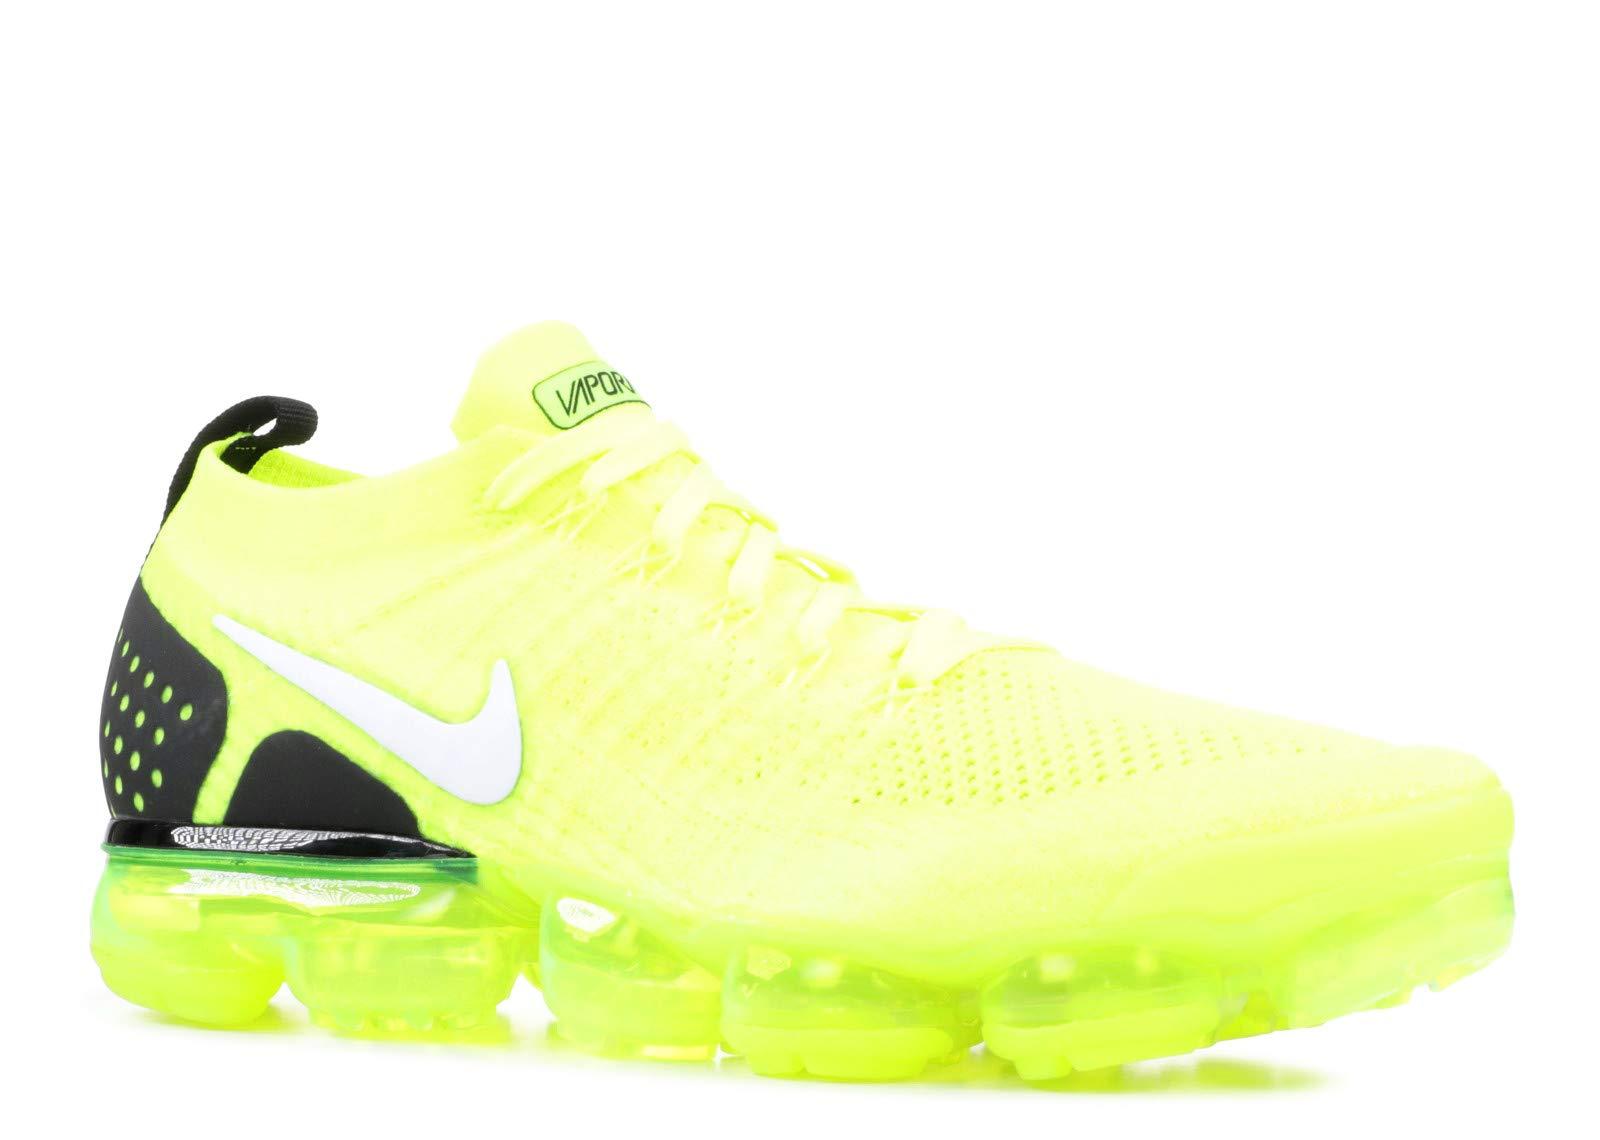 Nike Men's Air Vapormax 2 Flyknit Volt/White/Black 942842-700 (Size: 7)